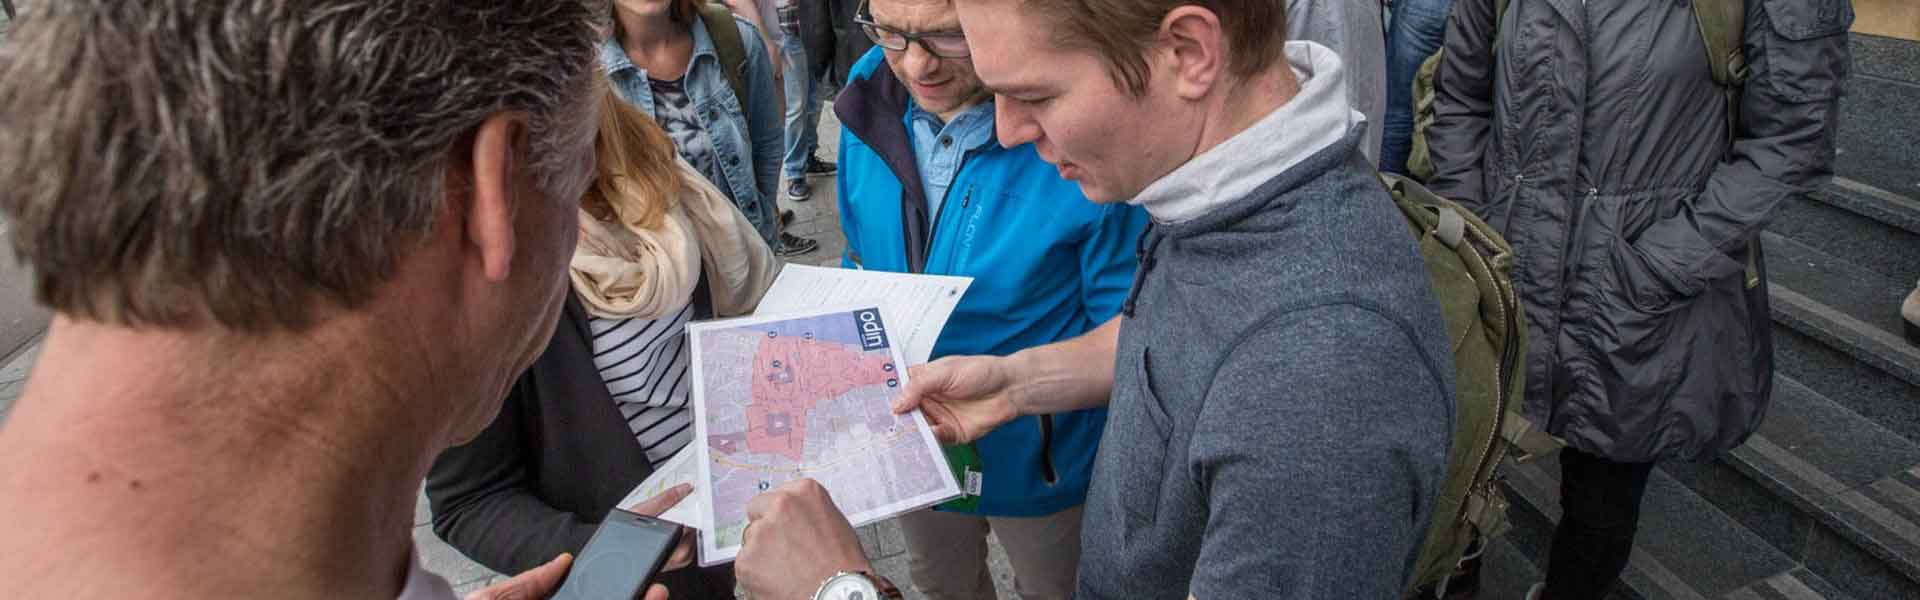 City Game Escape | Bedrijfsuitjes in Twente